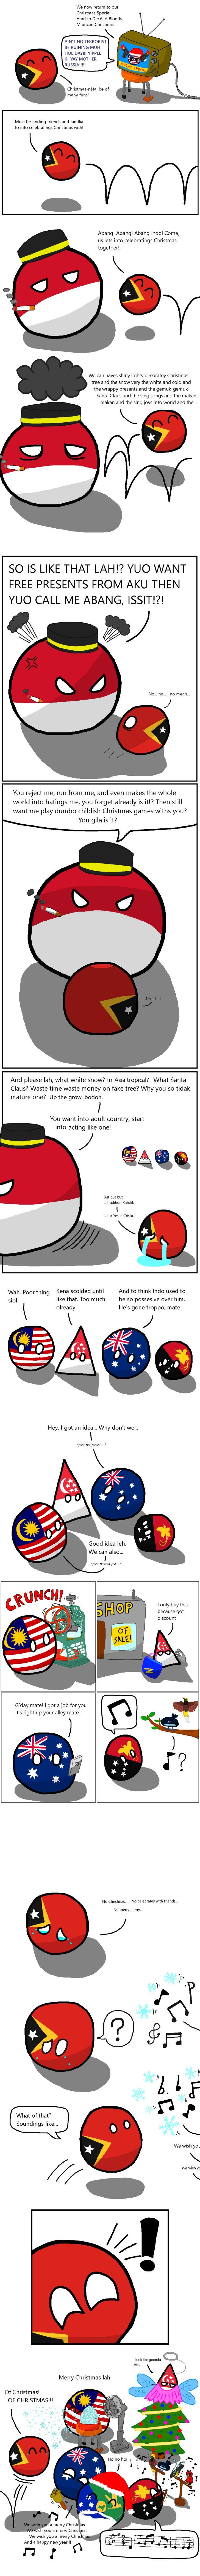 Me meaning of polish flag - Christmastime For East Timor